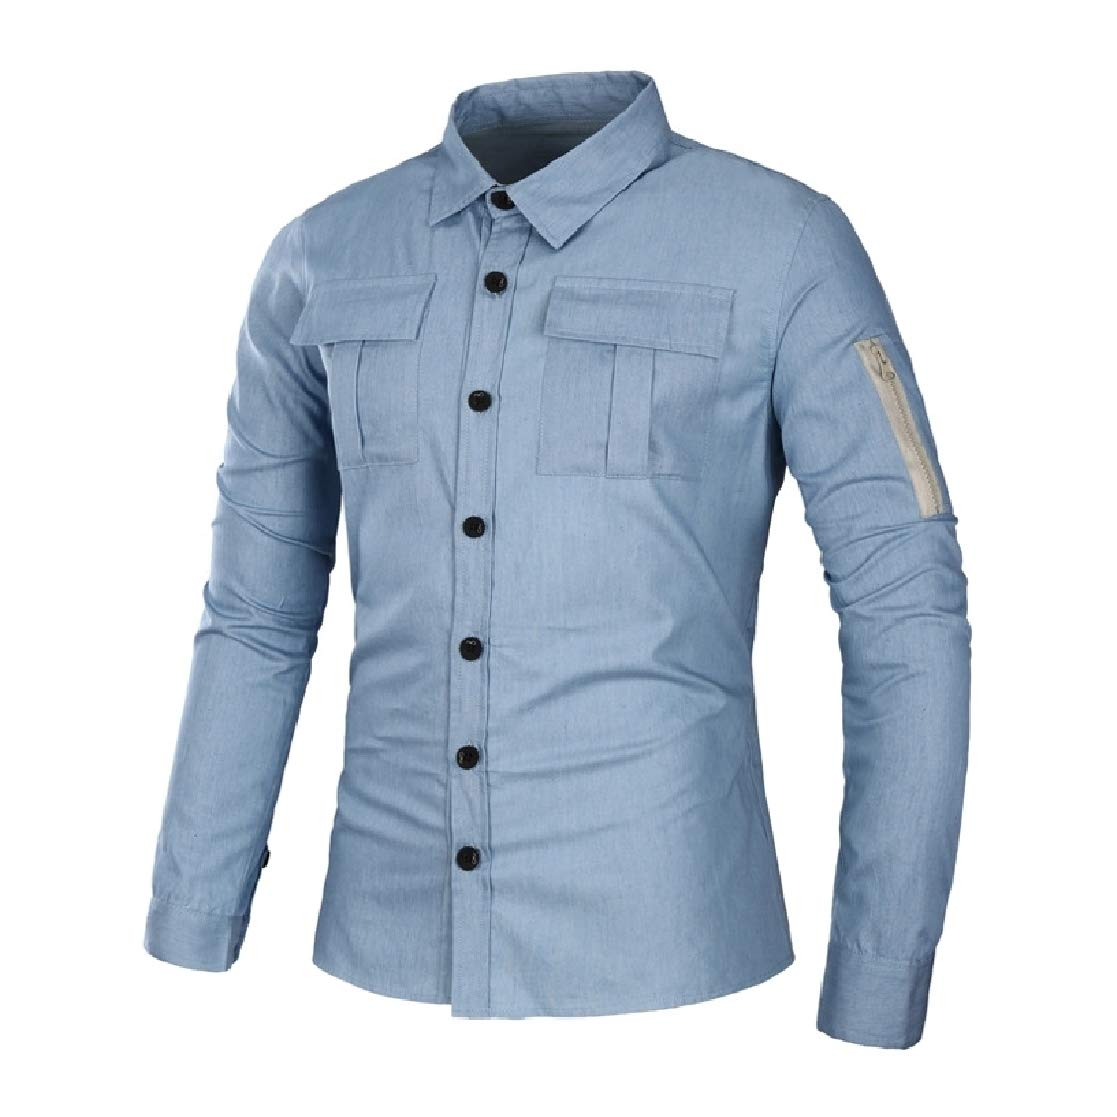 YUNY Men Denim Single-Breasted Vintage Oversize Dress Shirts Top Light Blue M